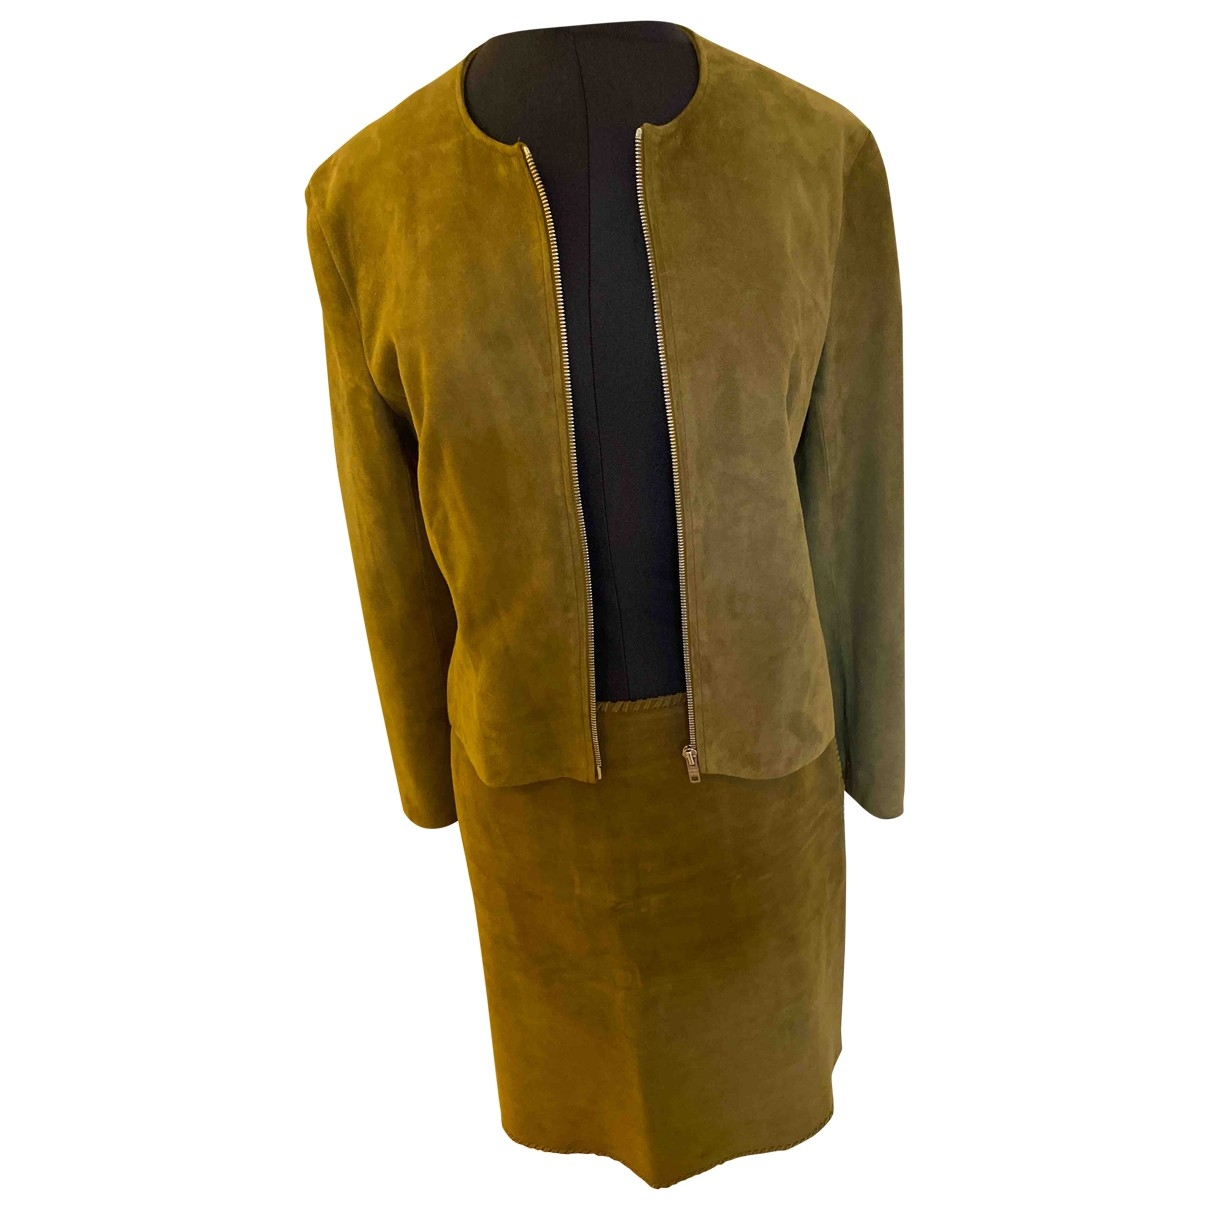 Celine \N Khaki Suede Leather jacket for Women 38 FR